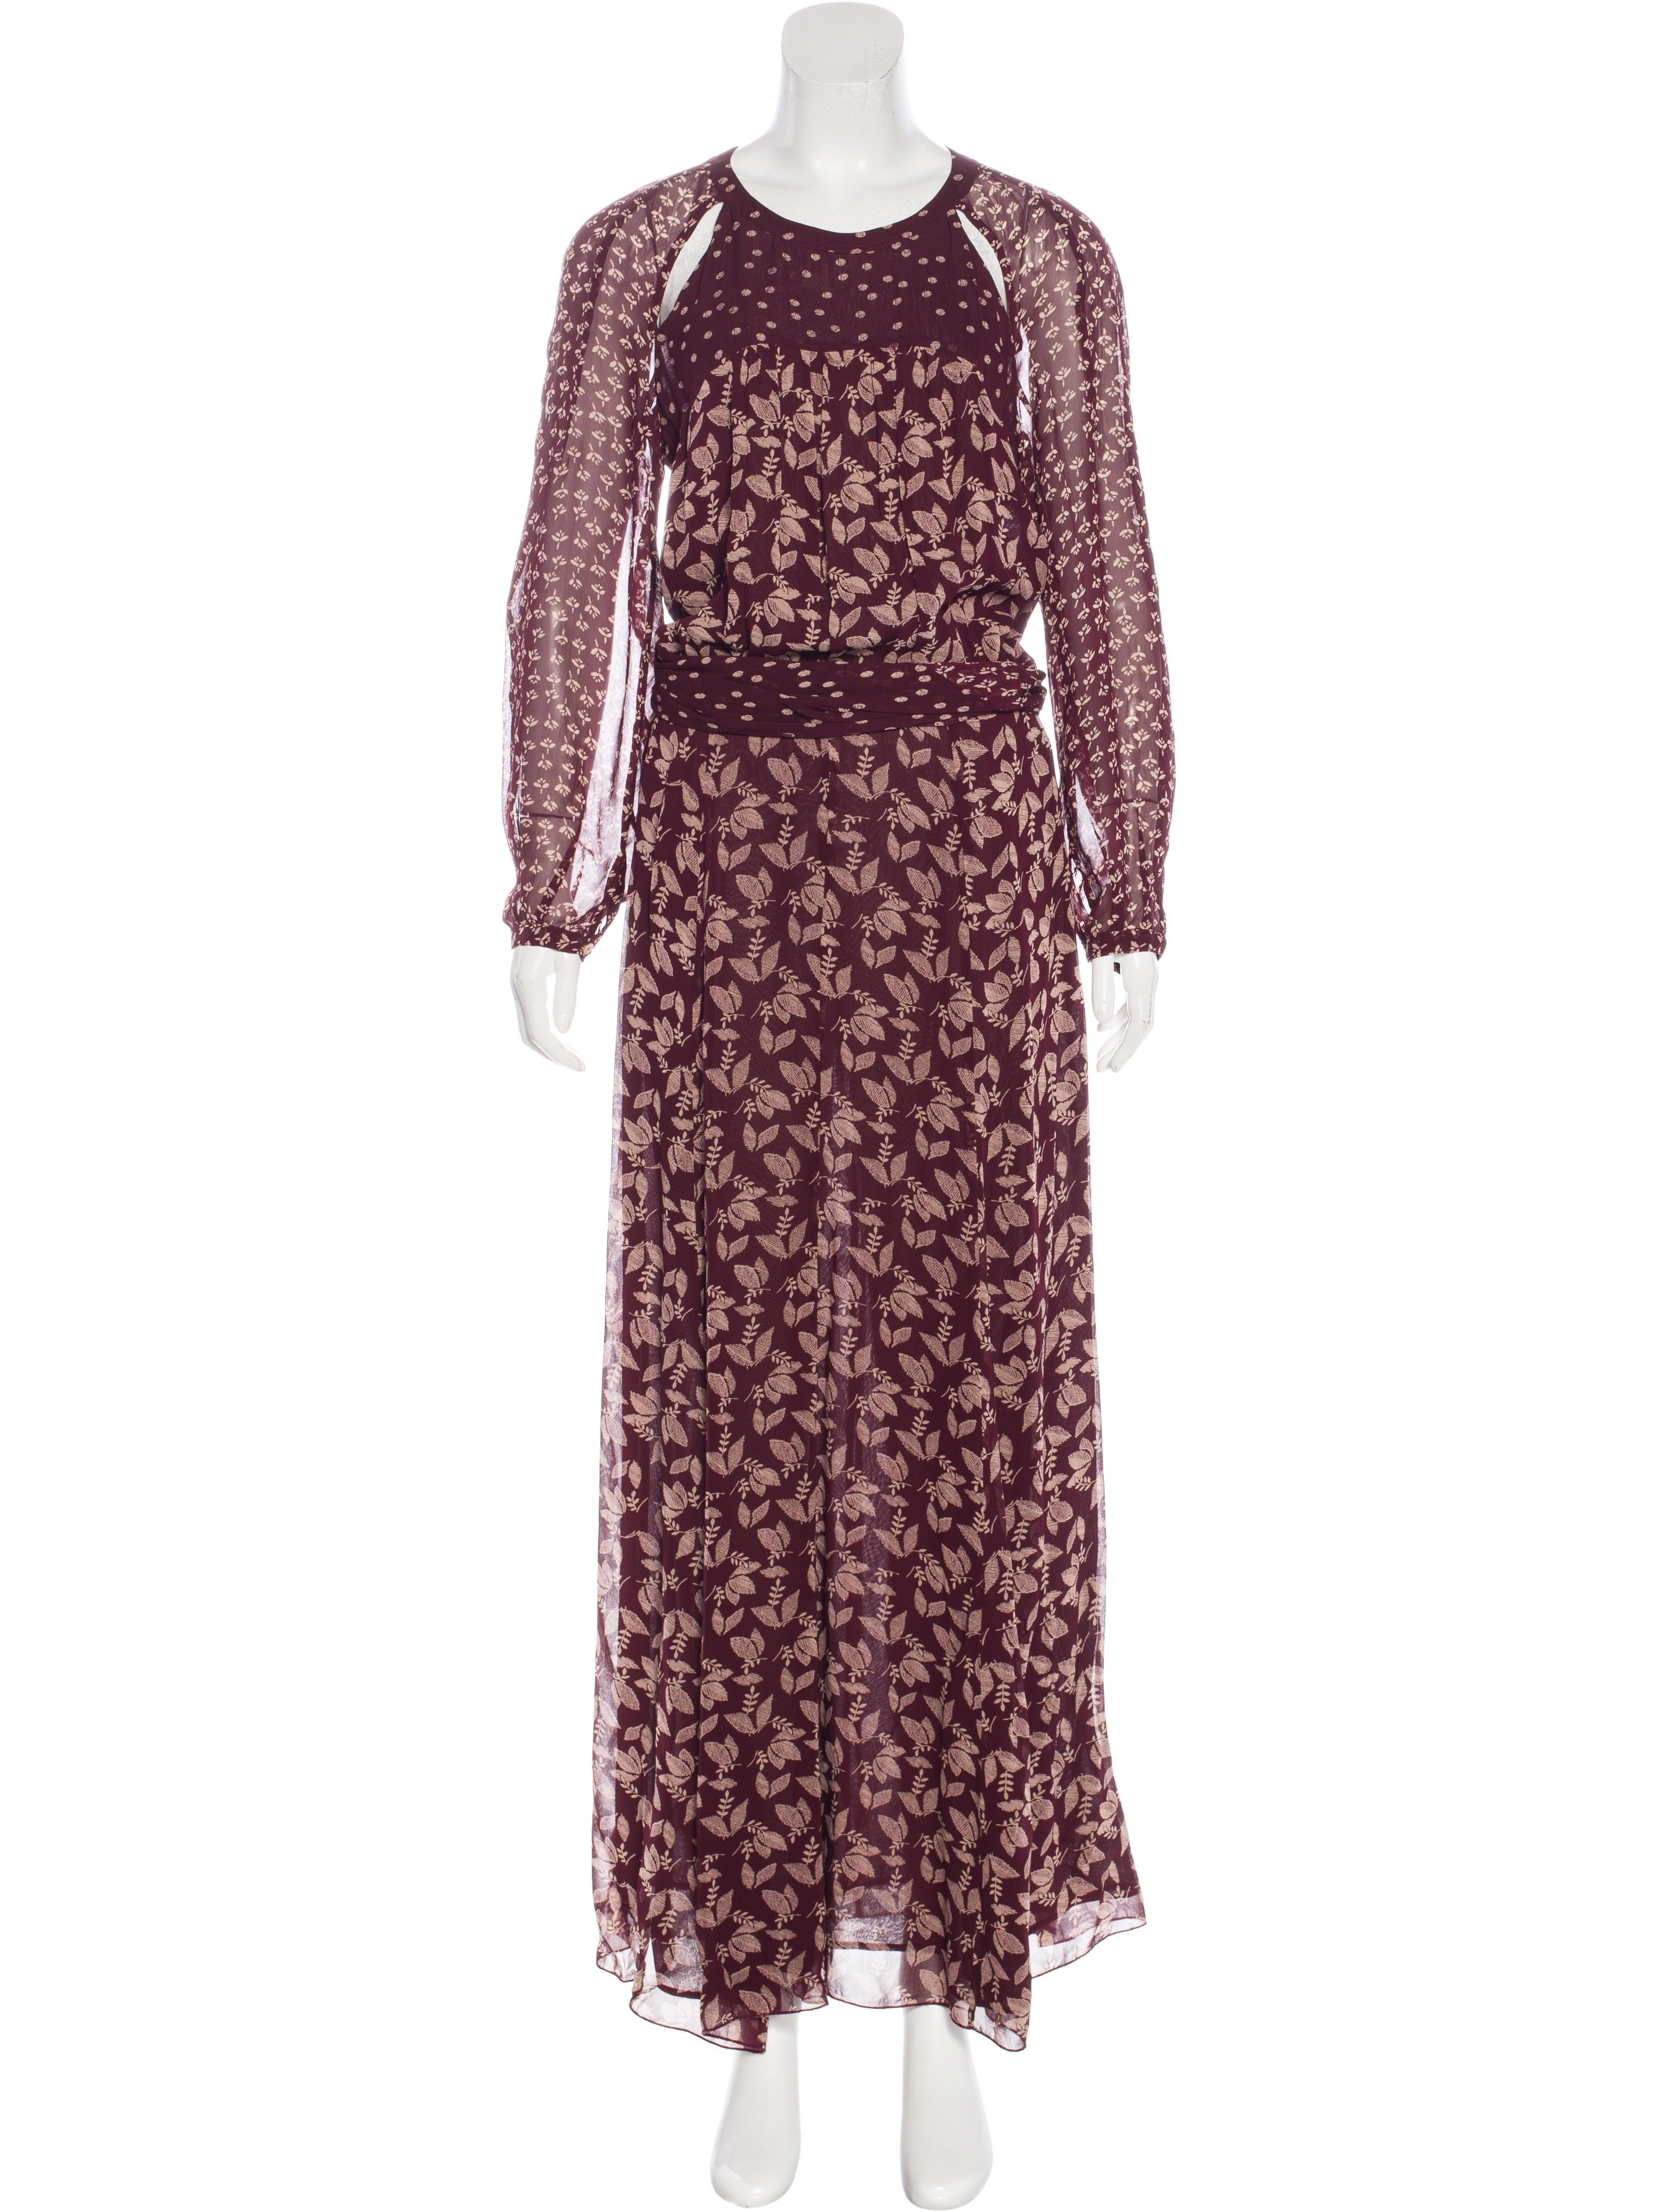 Toile isabel marant printed maxi dress clothing for Isabel marant shirt dress